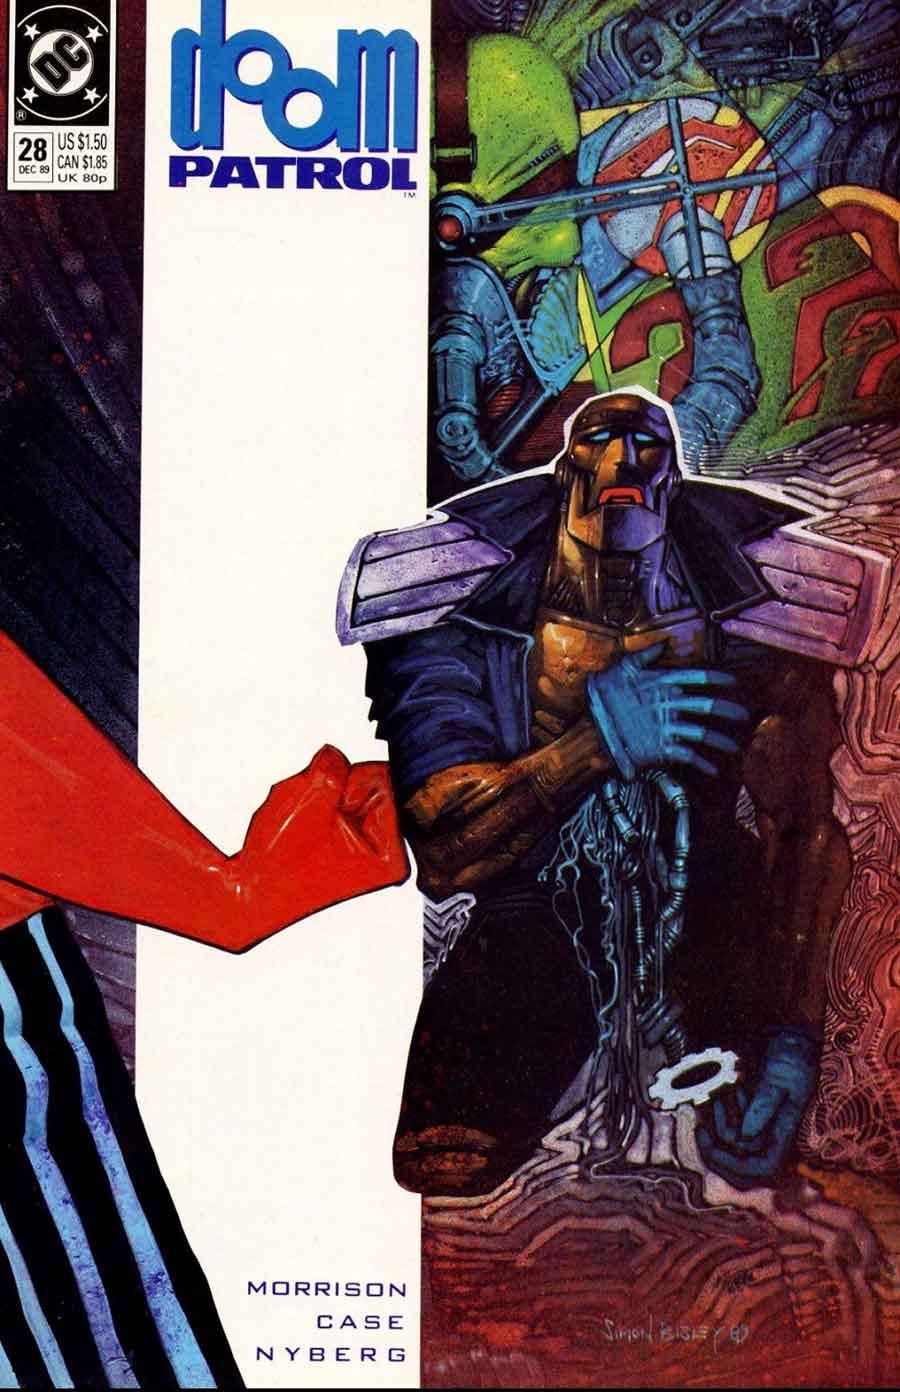 Doom Patrol #28 cover by Simon Bisley